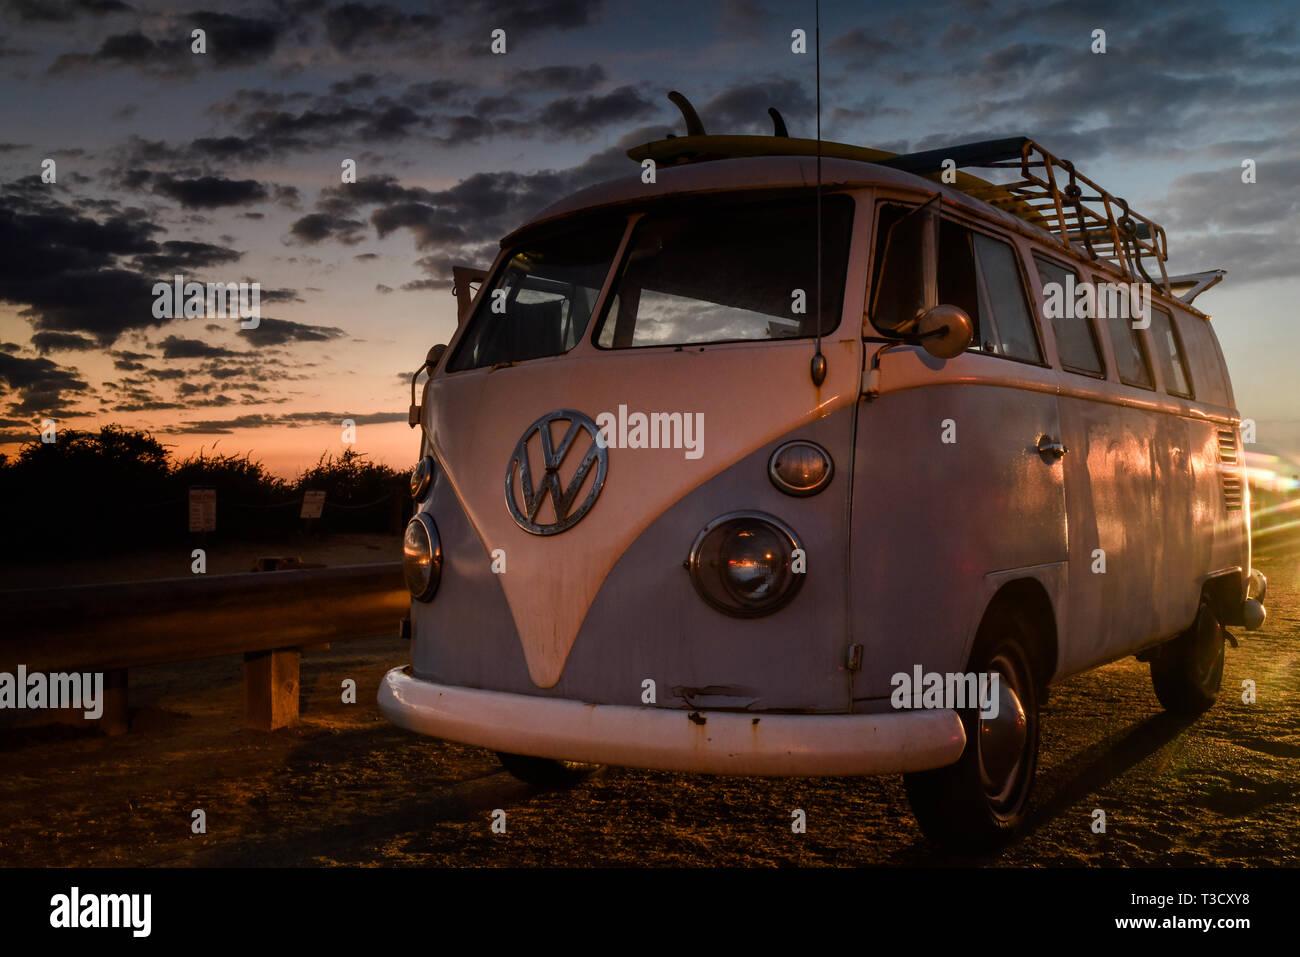 Vw San Diego >> Vintage Volkswagon Vw Microbus With Rooftop Rack For